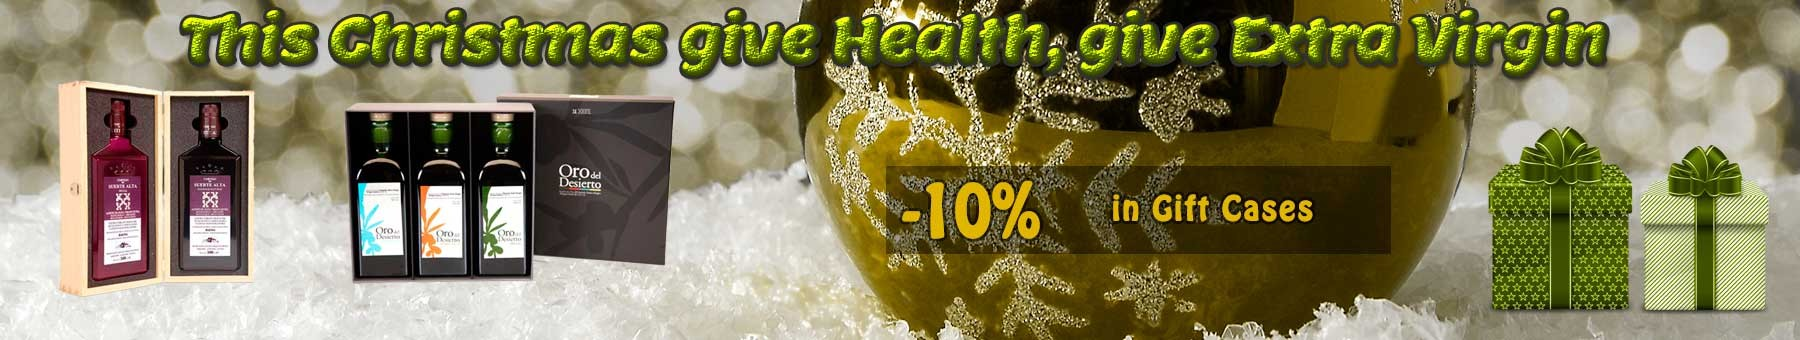 Olive oil gift cases for Christmas